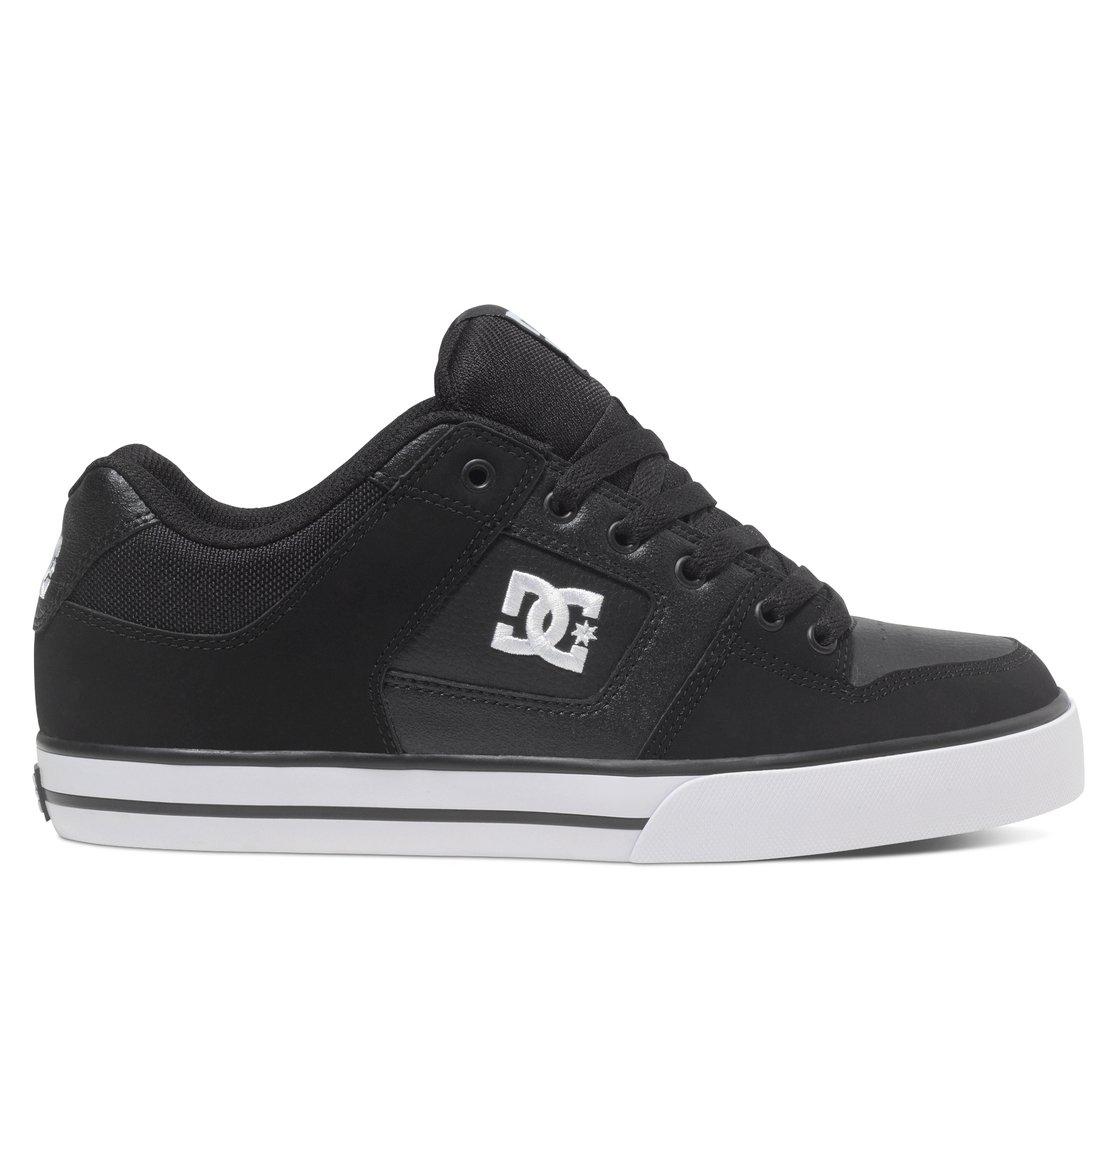 Dc Shoes D Ef Bf Bdbardeur